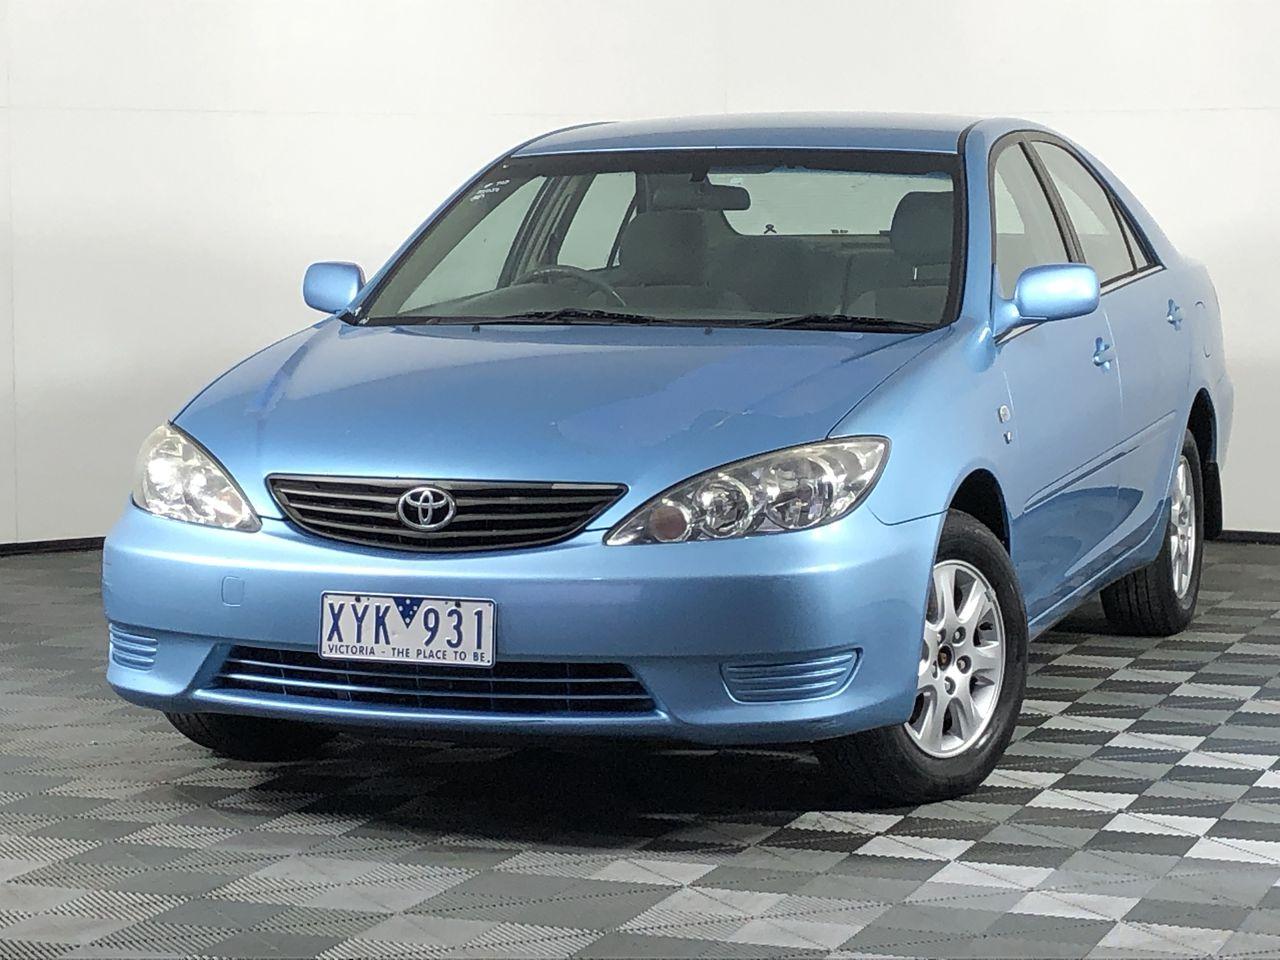 2006 Toyota Camry Altise MCV36R Automatic Sedan